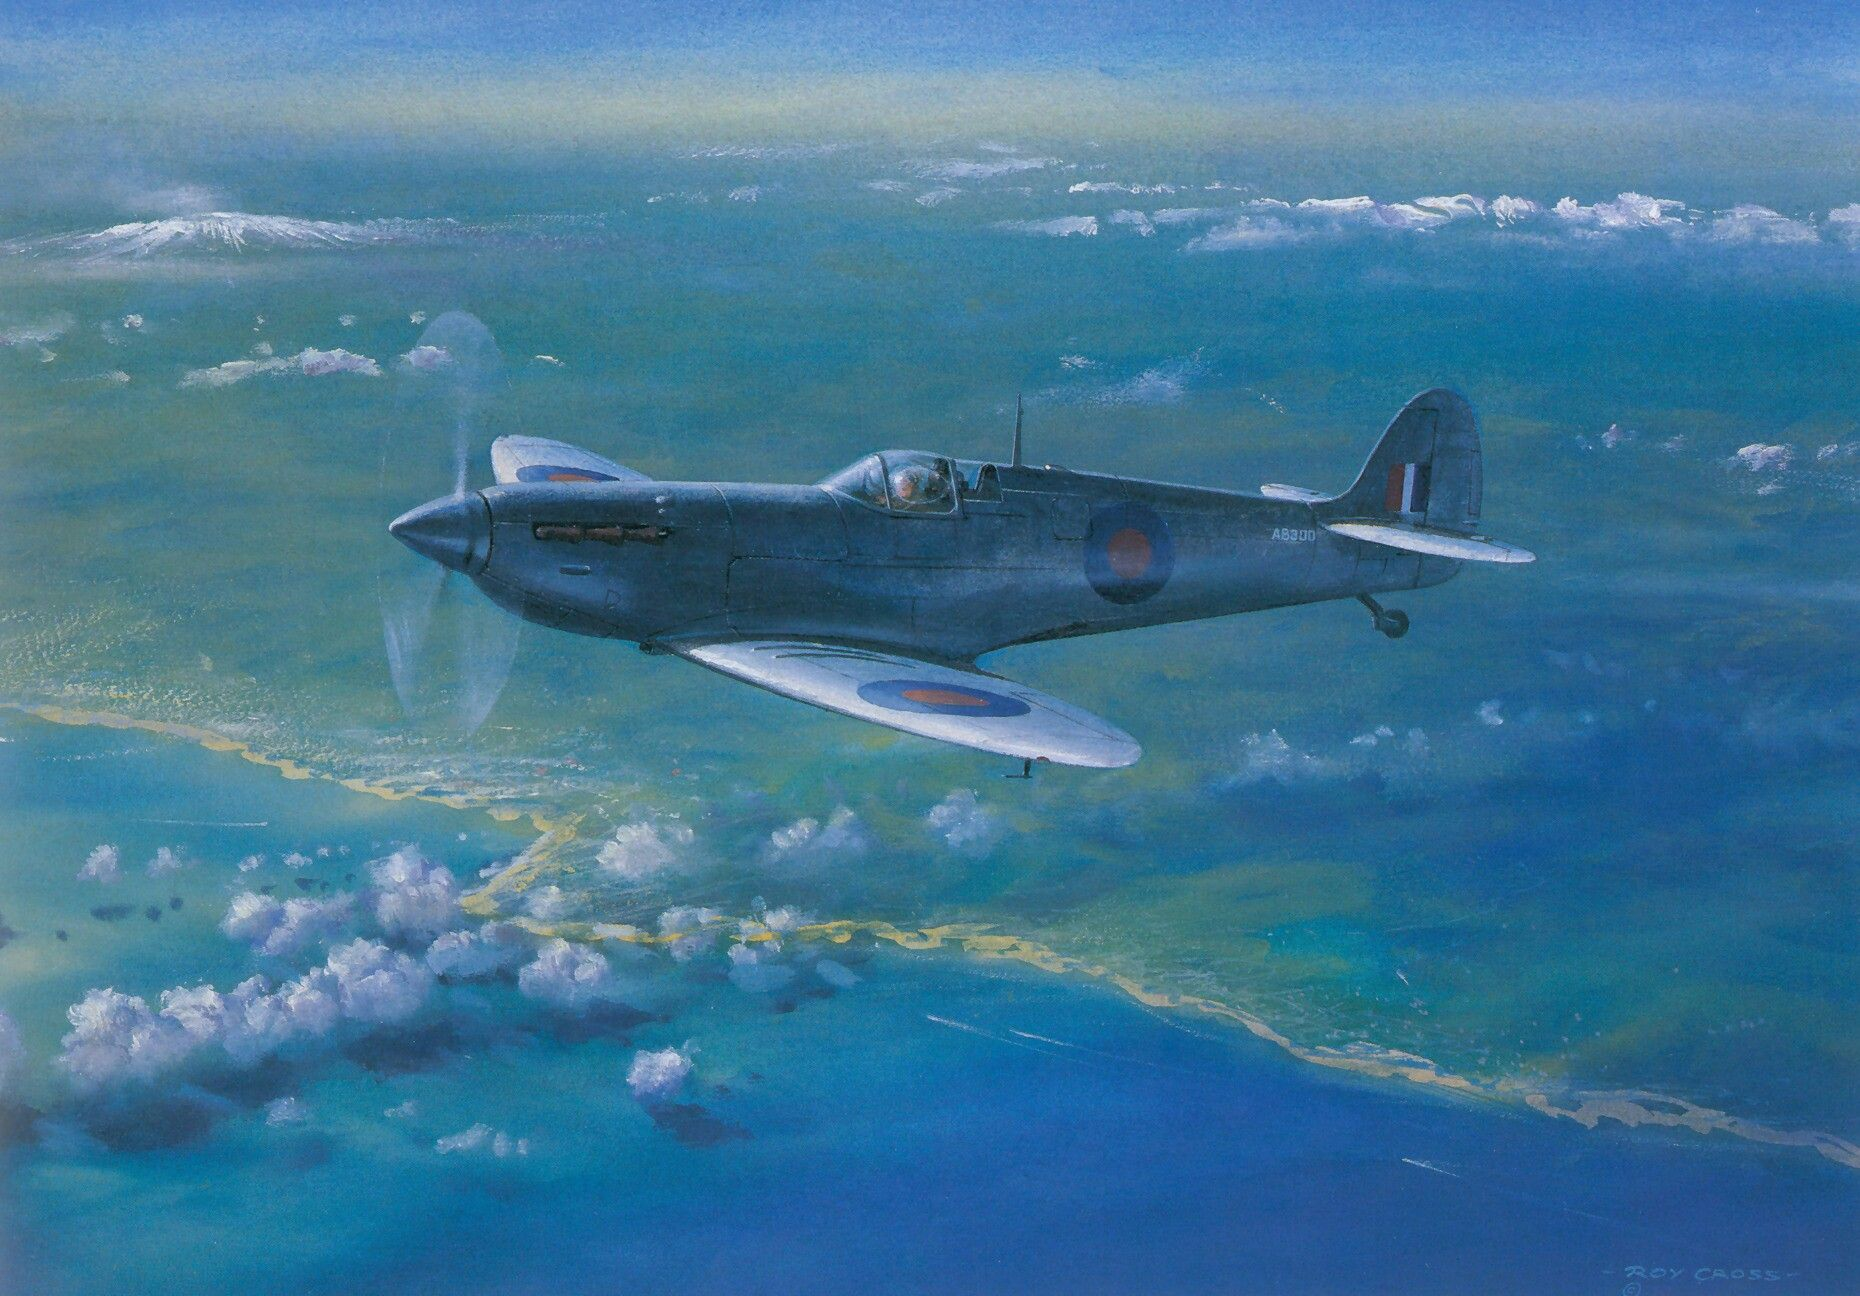 """Spitfire"" PR. l (Reconocimiento Fotográfico) Wwii plane"